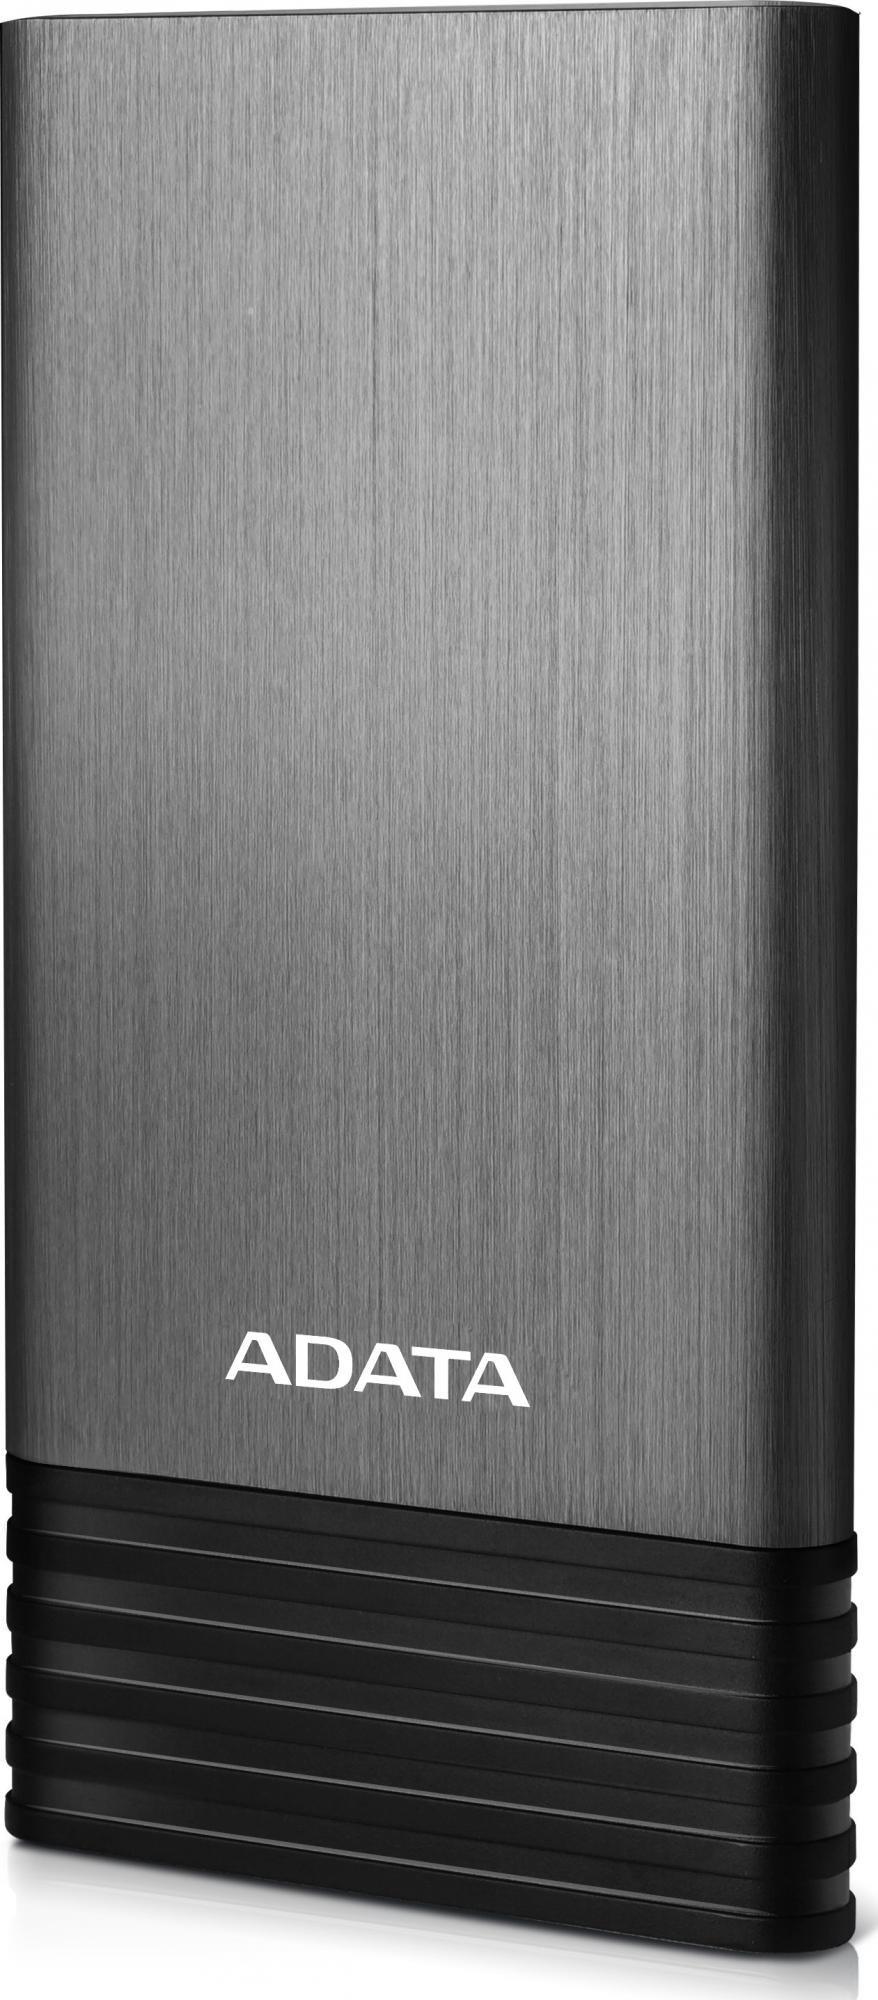 ADATA X7000 Power Bank 7000mAh titánová